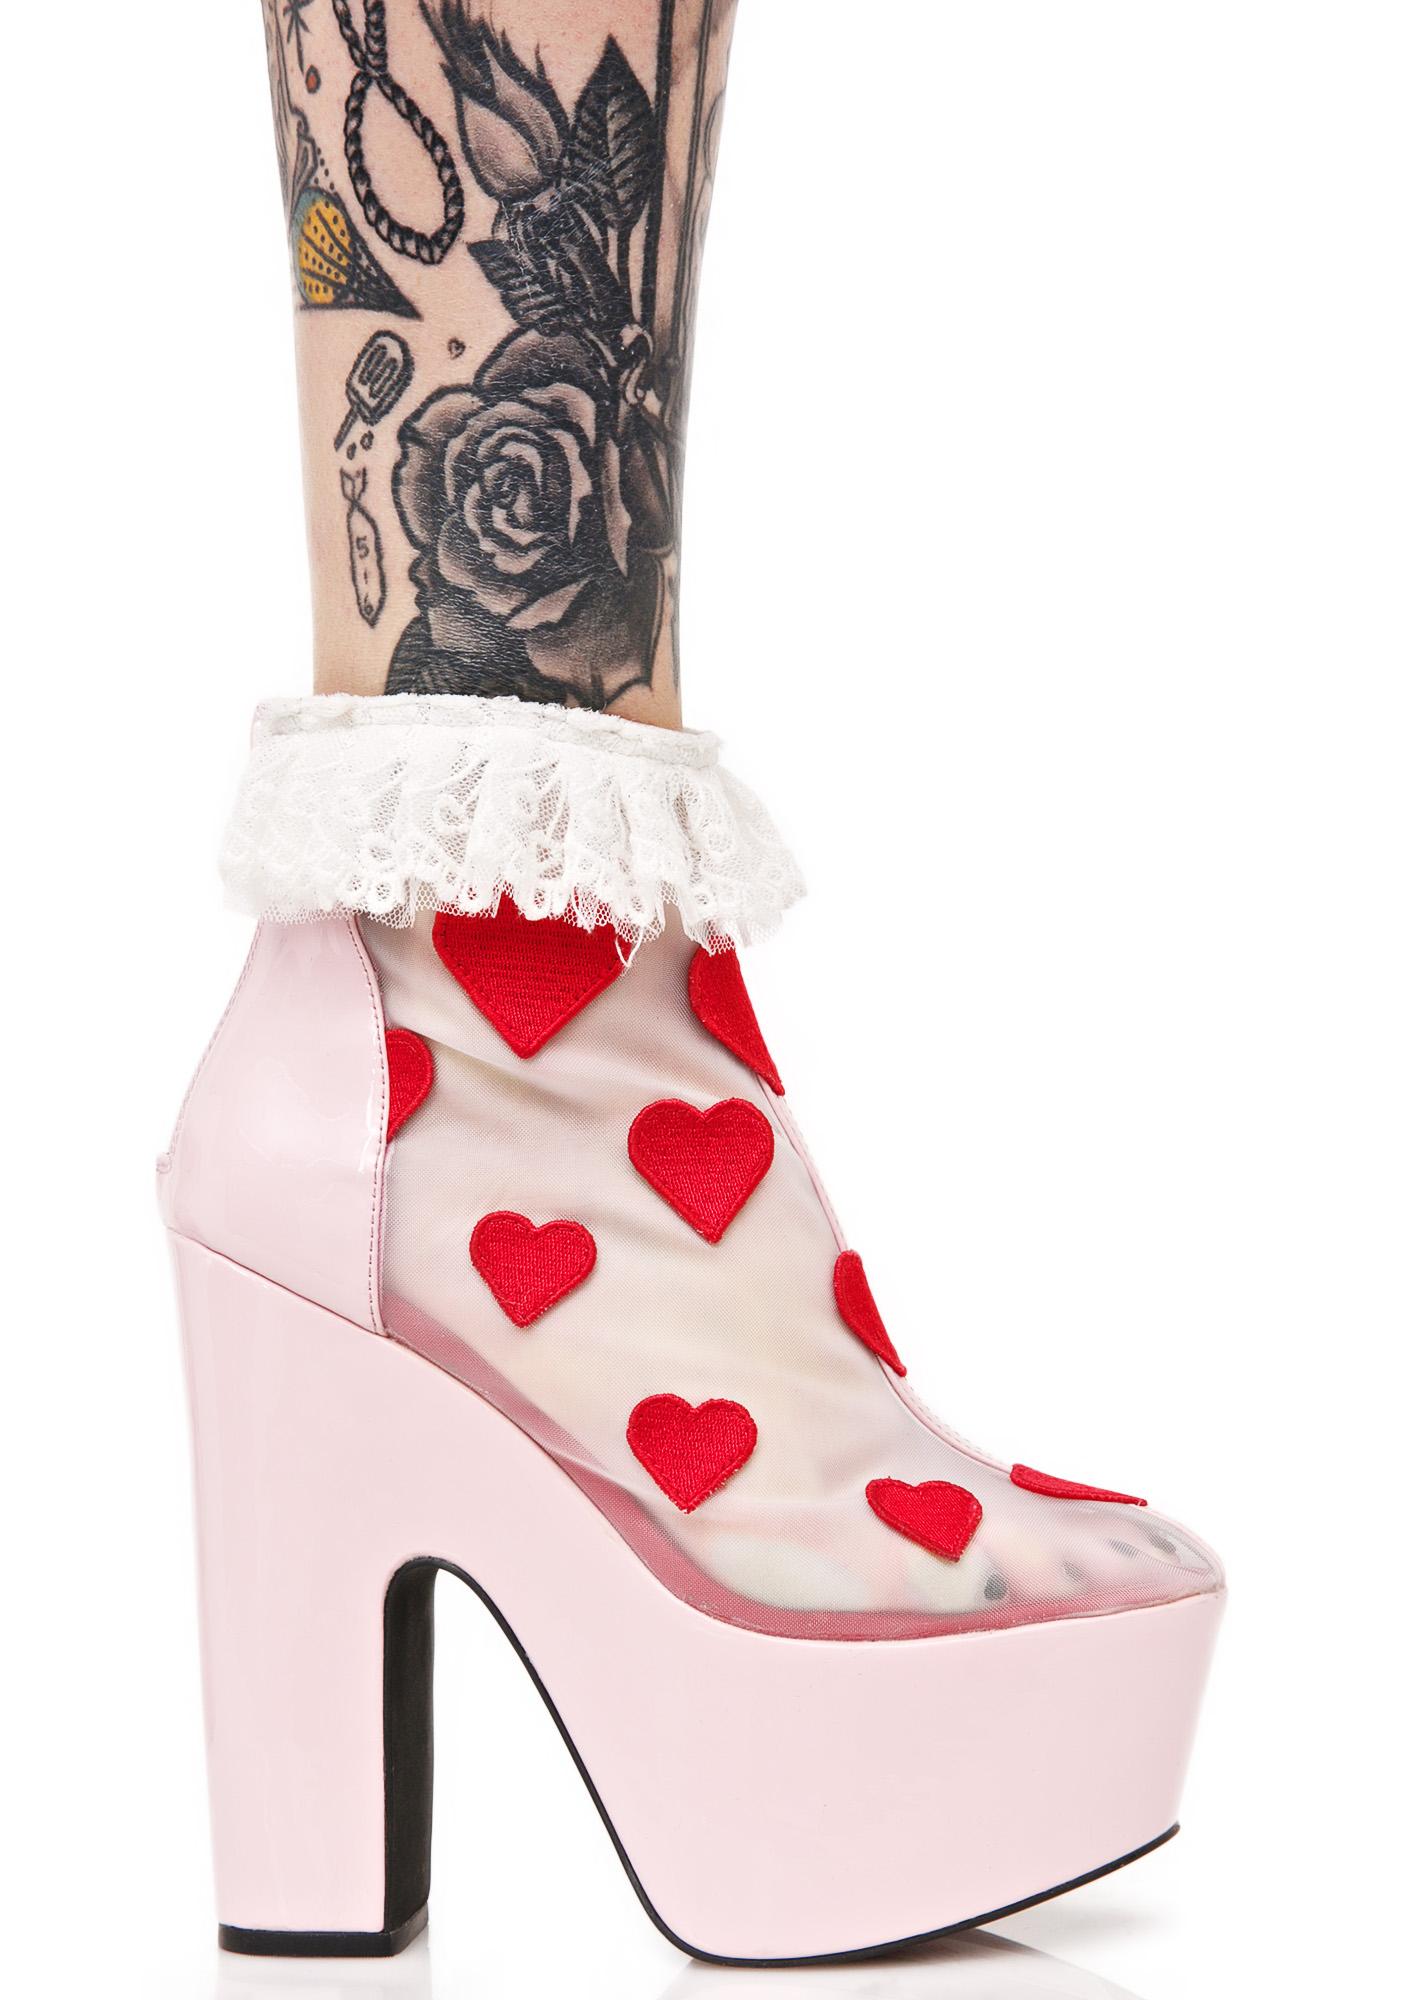 Sugar Thrillz Heart Printed High Heels